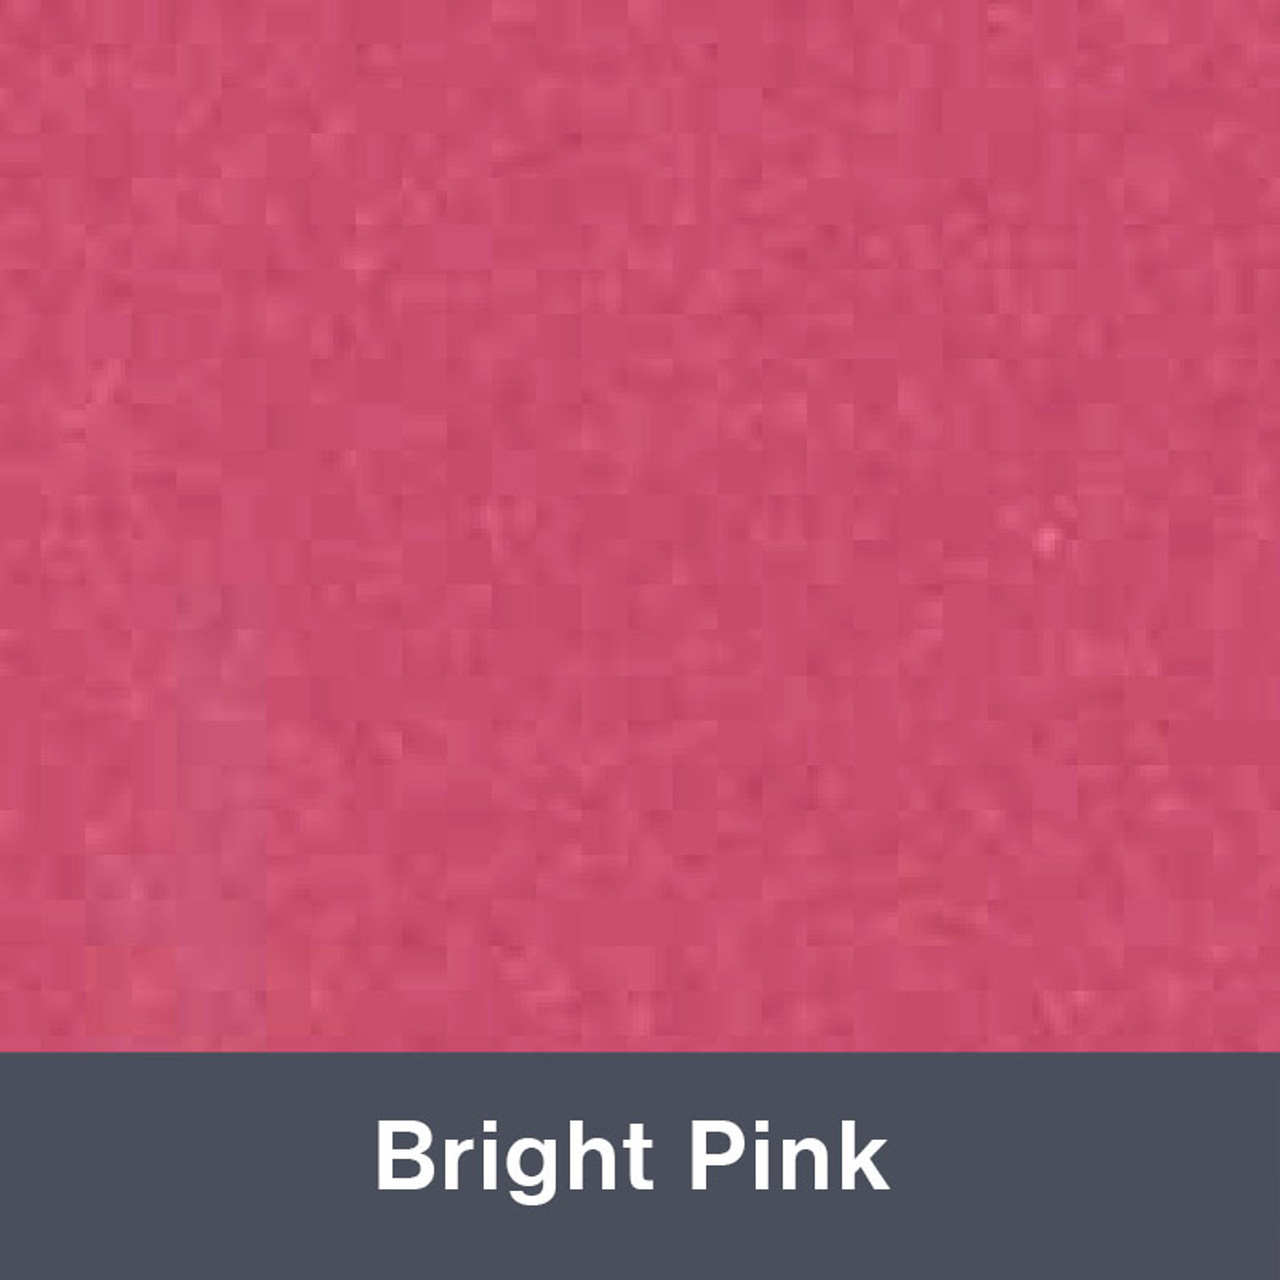 Iron-on Bright Pink Turbo 4925